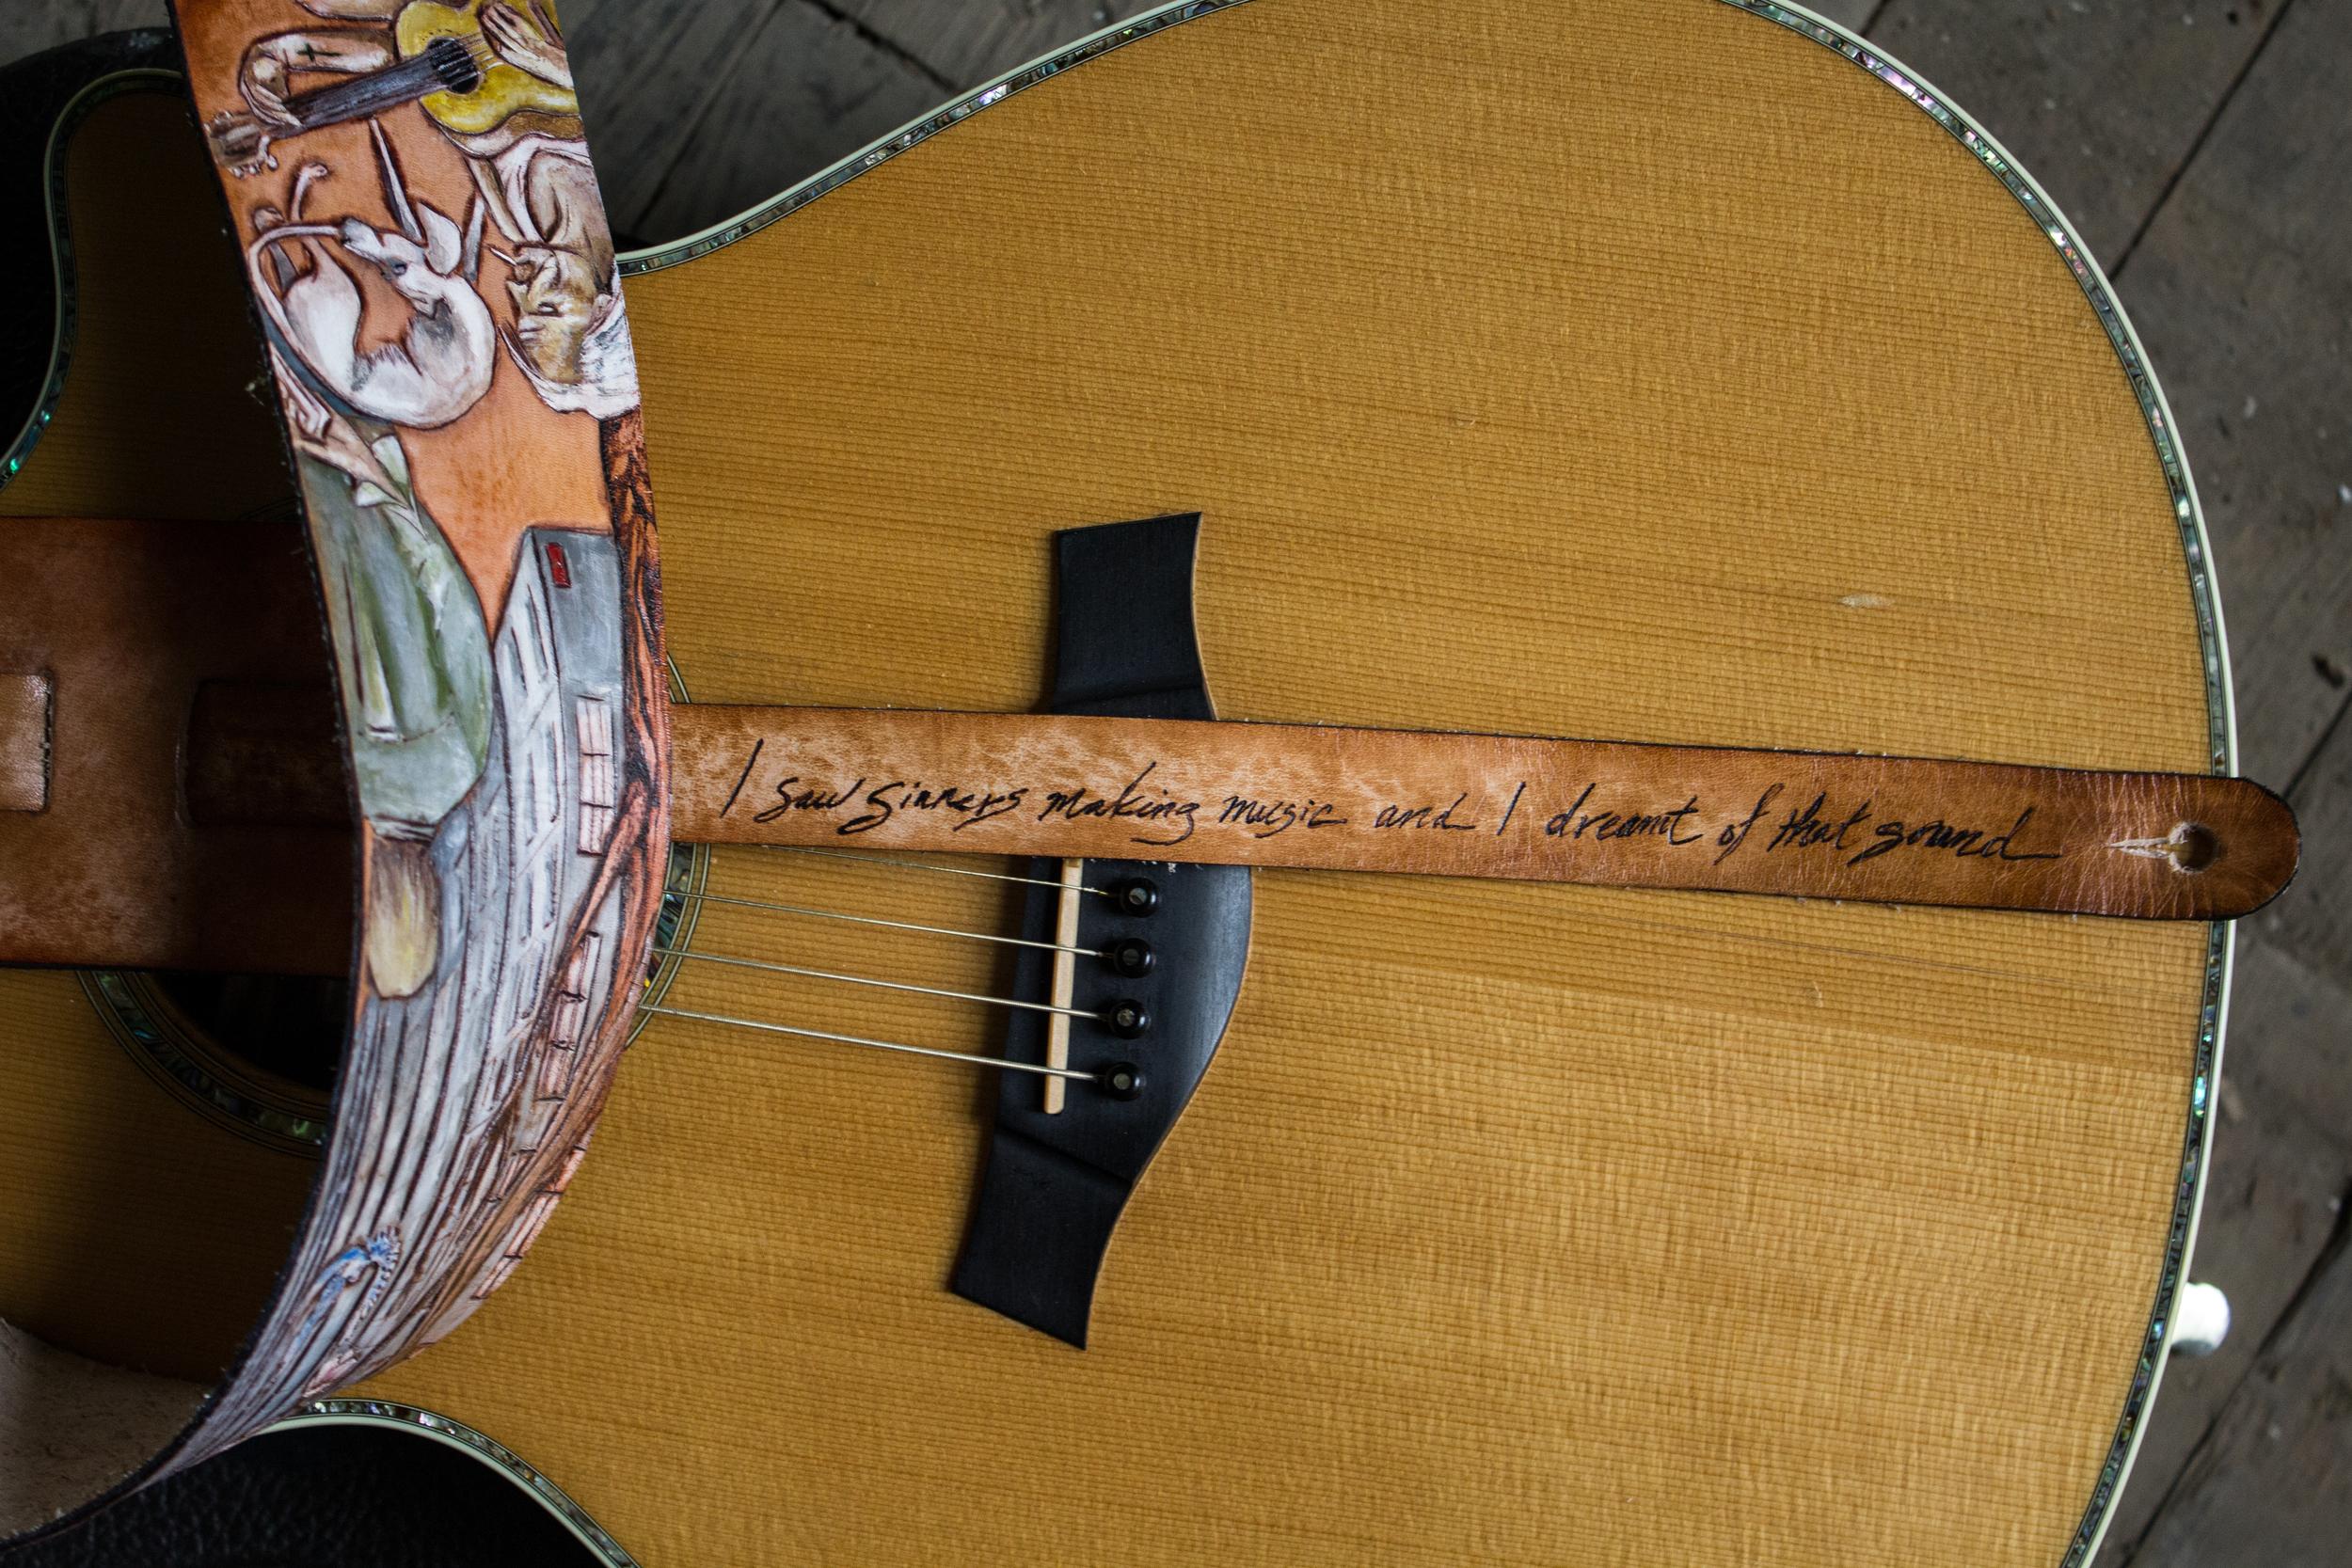 iron-and-wine-custom-guitar-strap-9.jpg